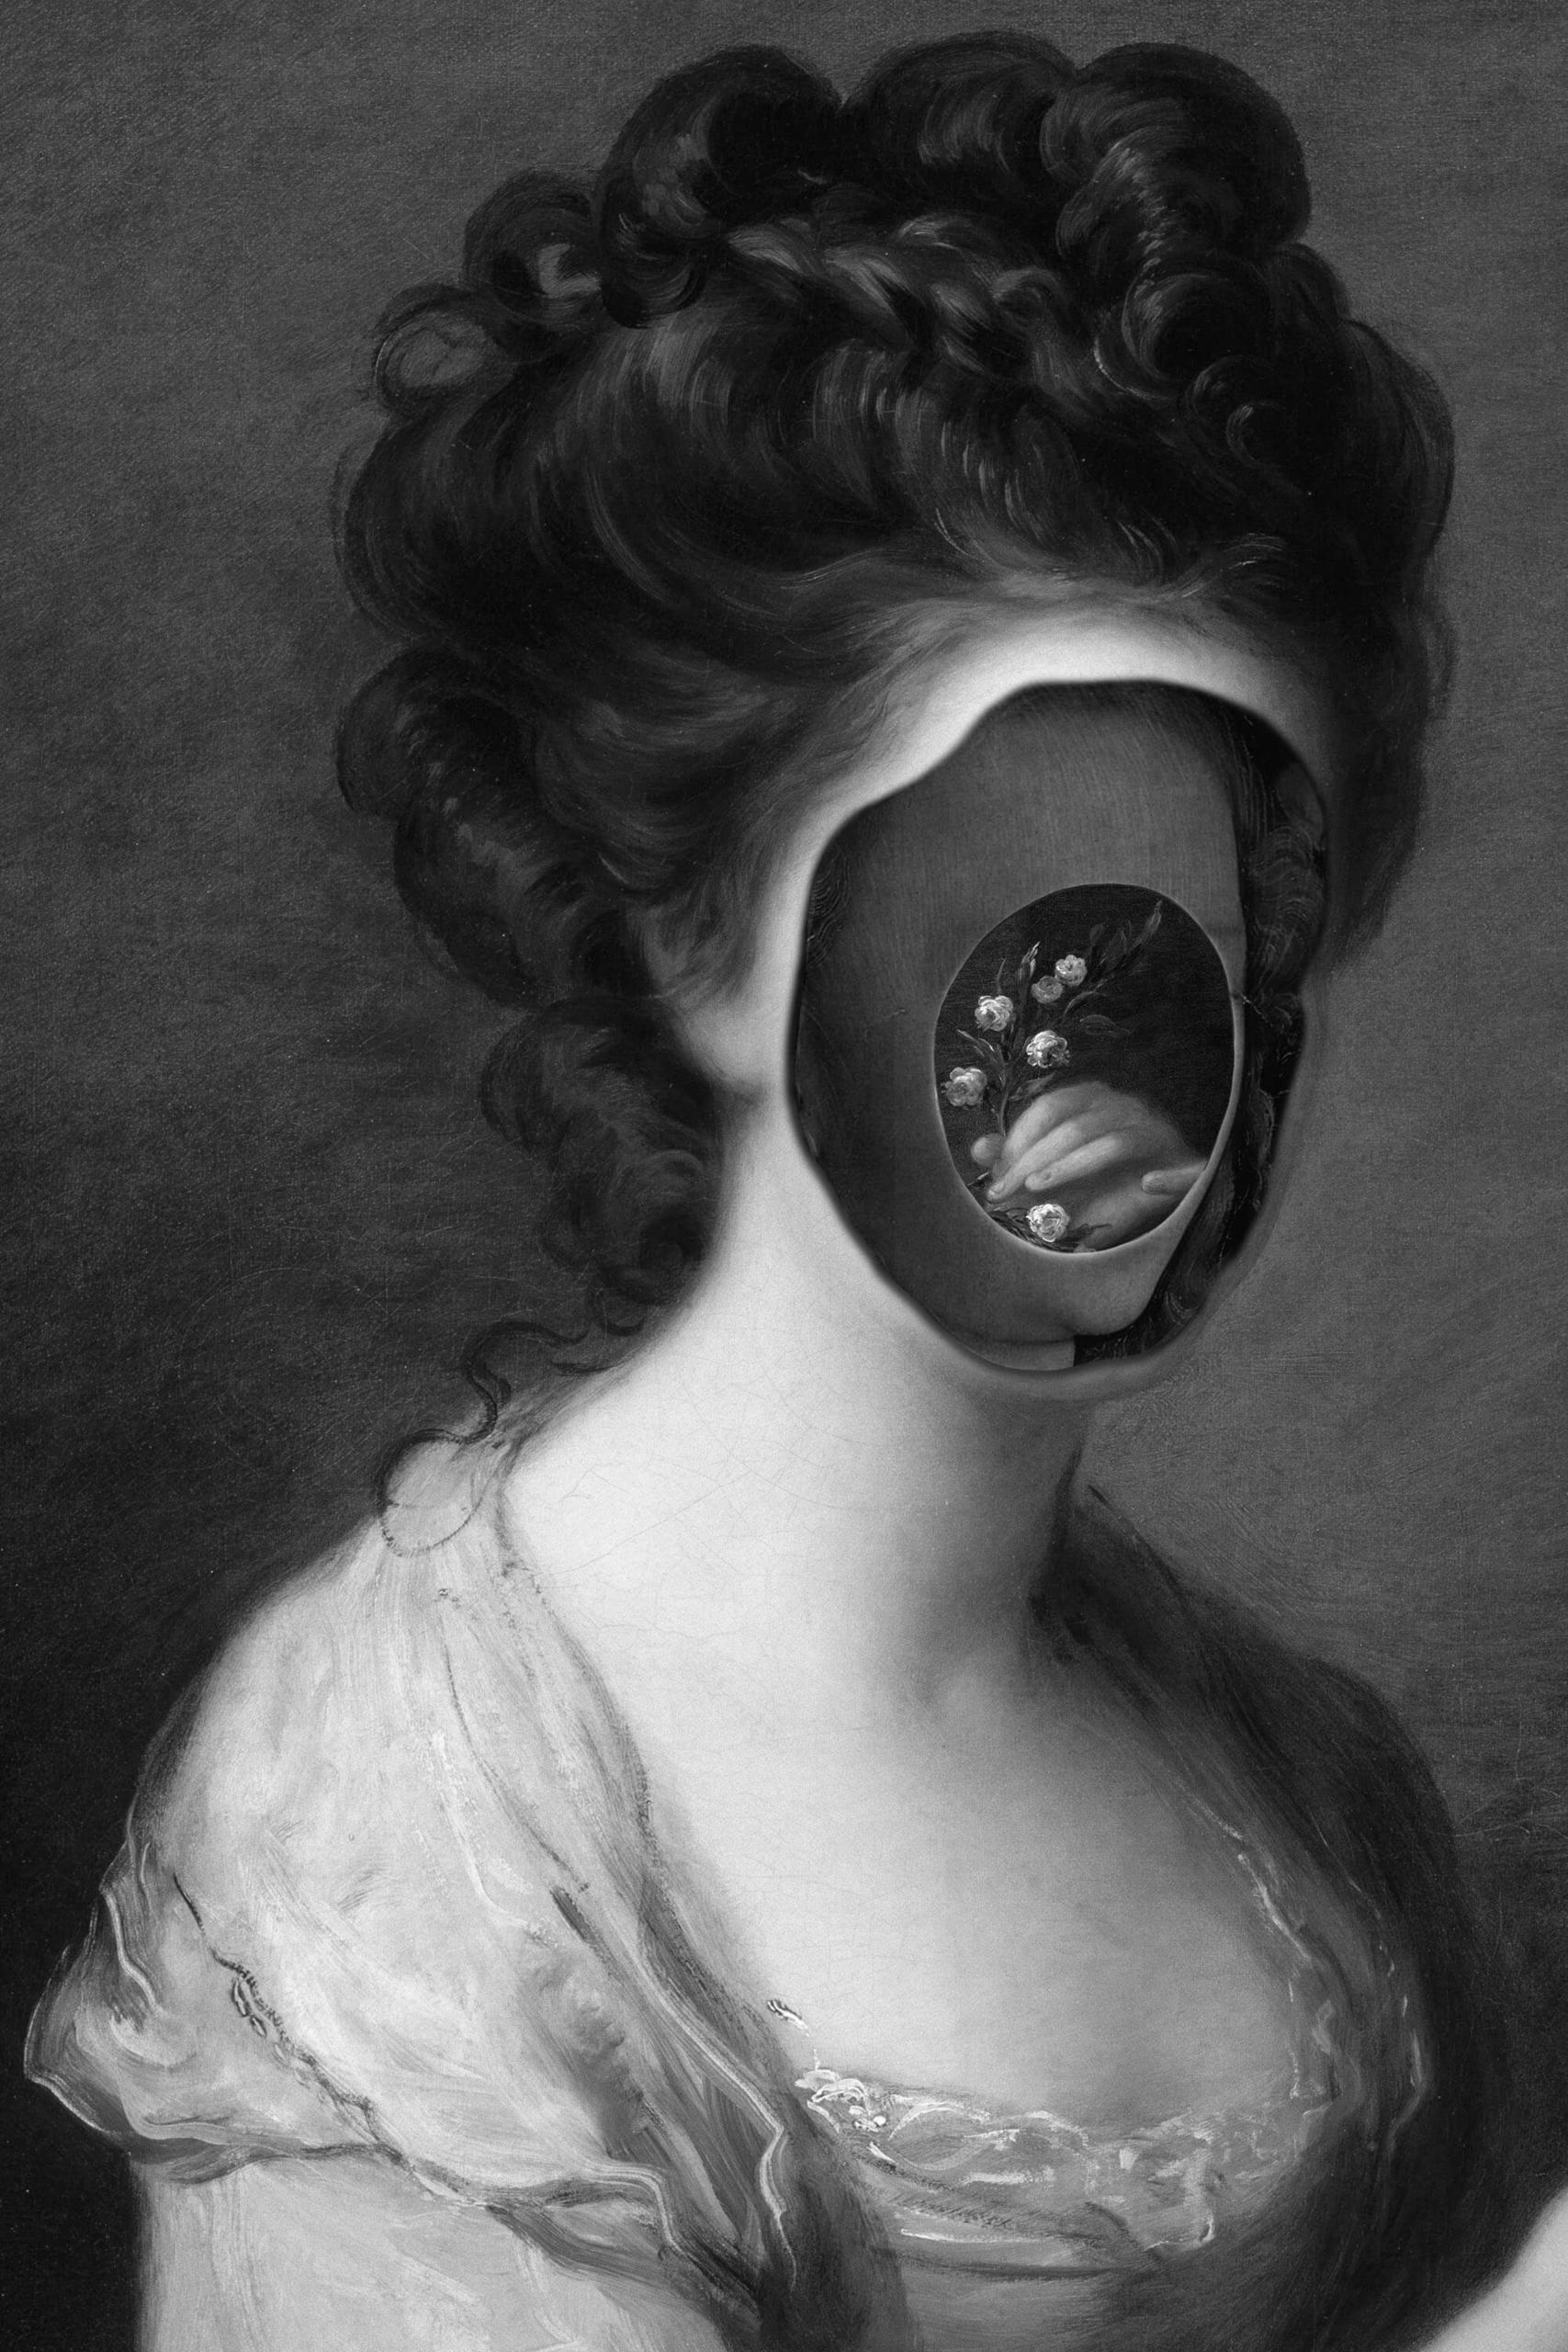 Collages Hidden Velvet Dark Sil - inag | ello